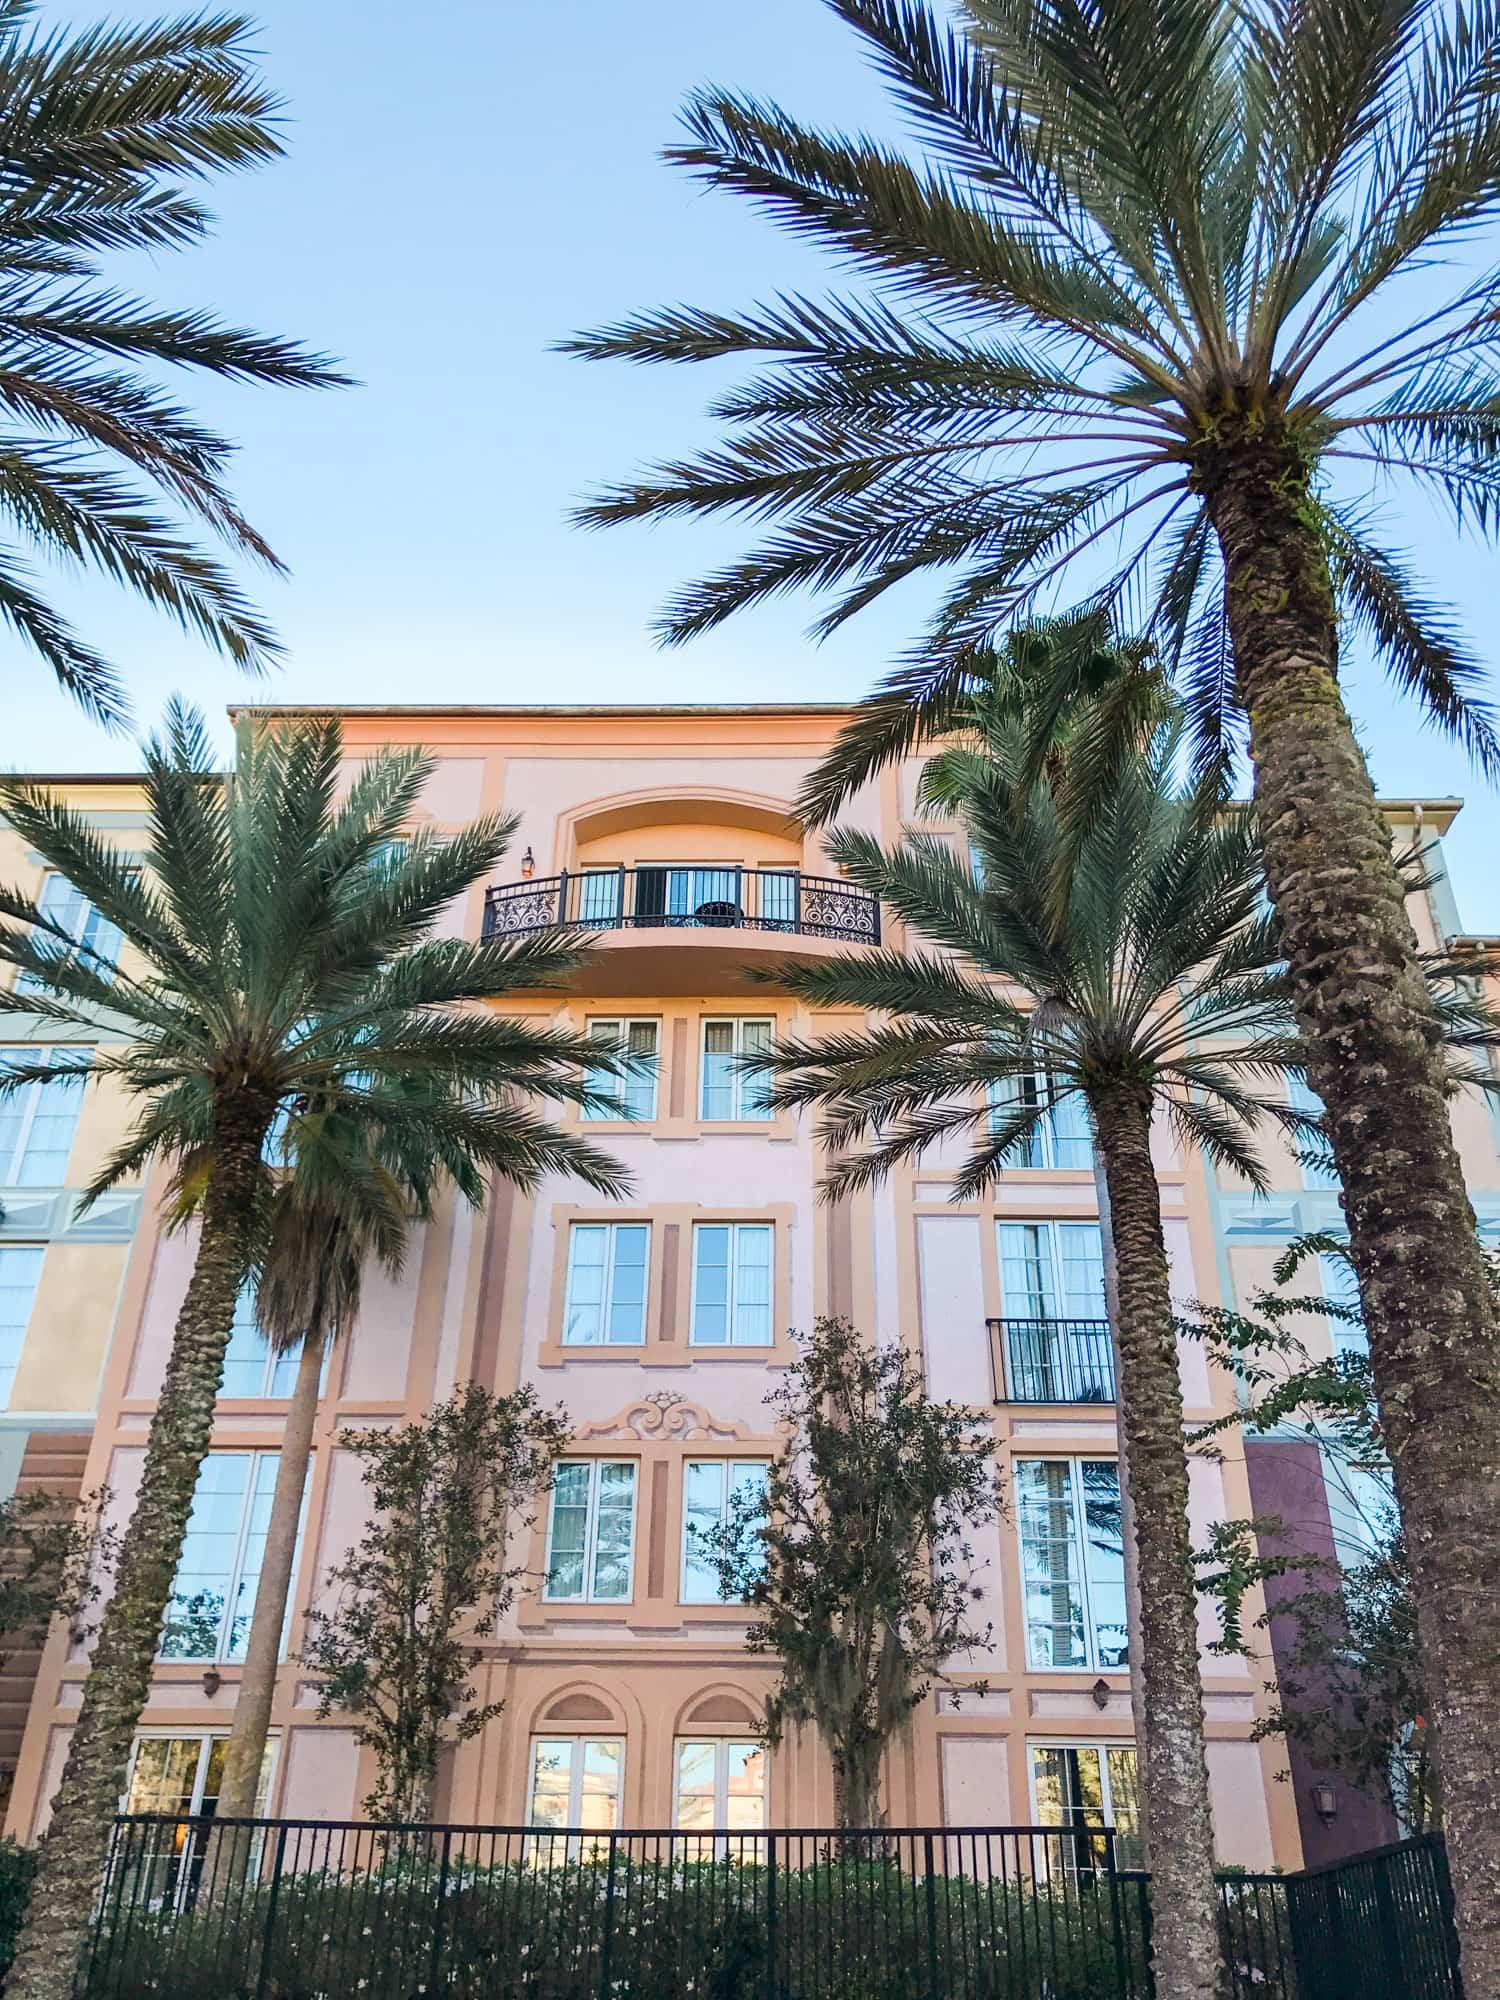 Portofino Bay palm trees hotel resort at Universal Orlando Florida